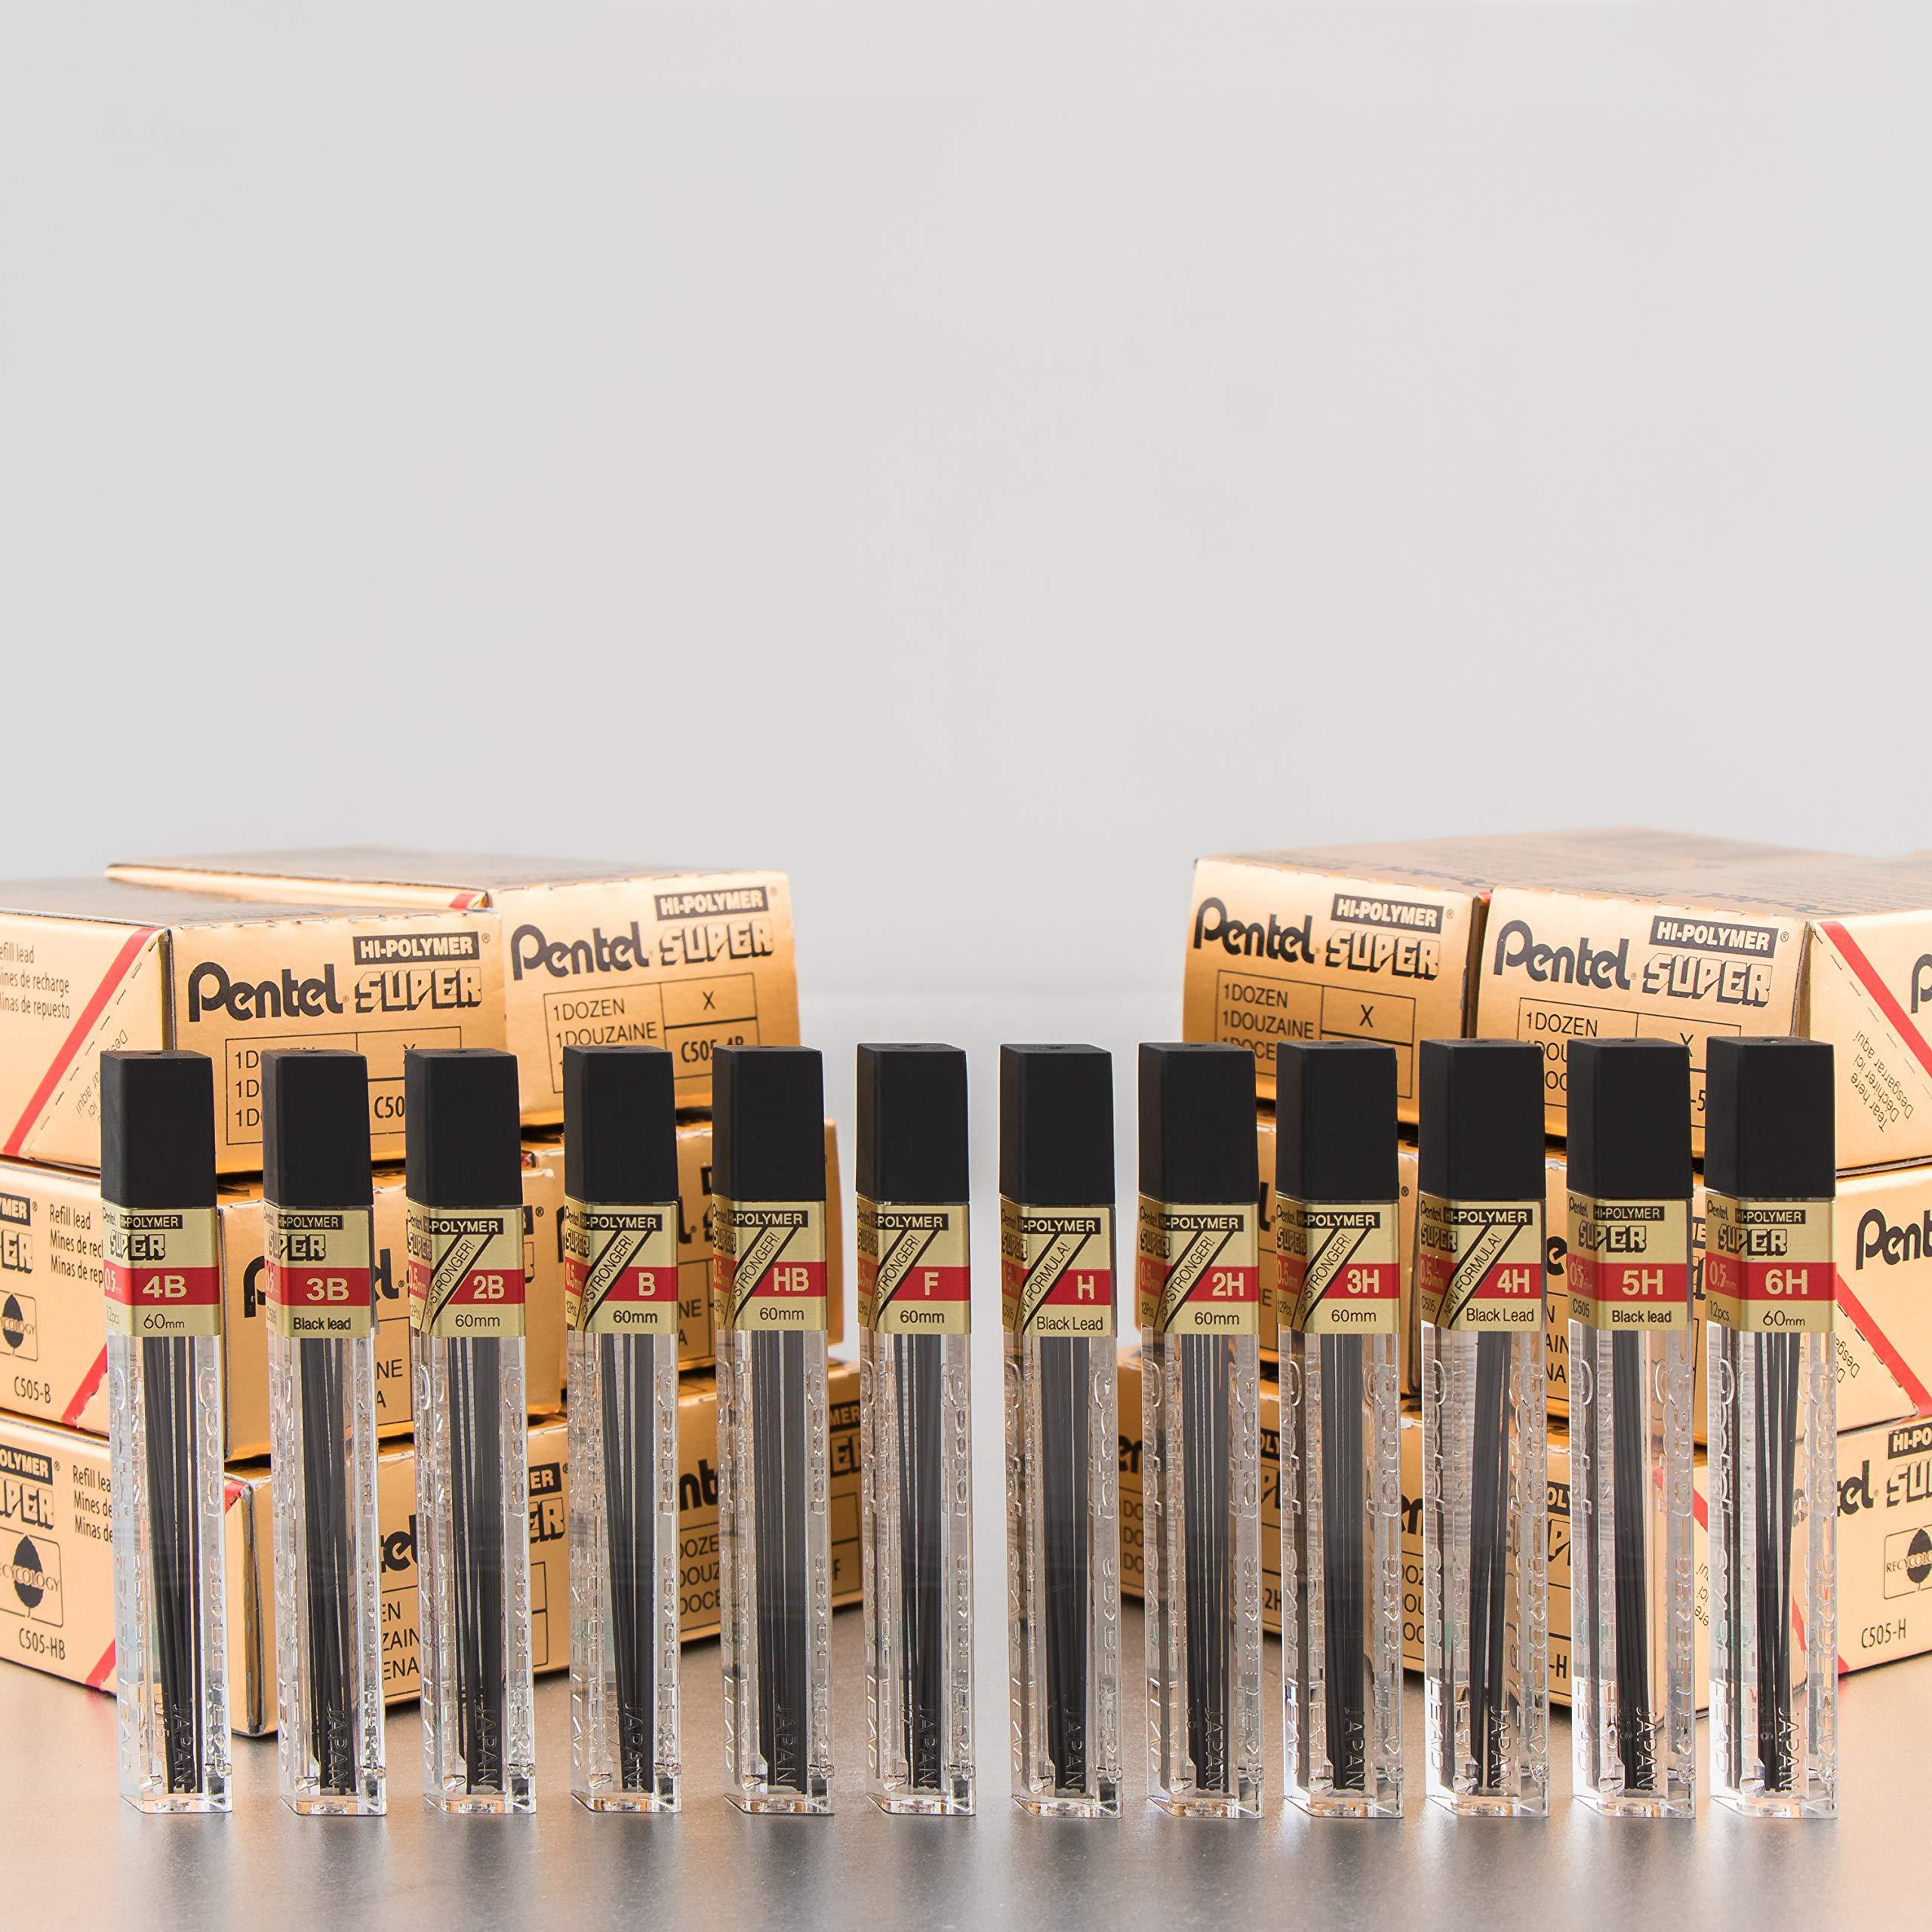 Pentel Super Hi-Polymer Lead Refill, 0.5mm, Fine, 2B, 144 Pieces of Lead (C505-2B) by Pentel (Image #5)